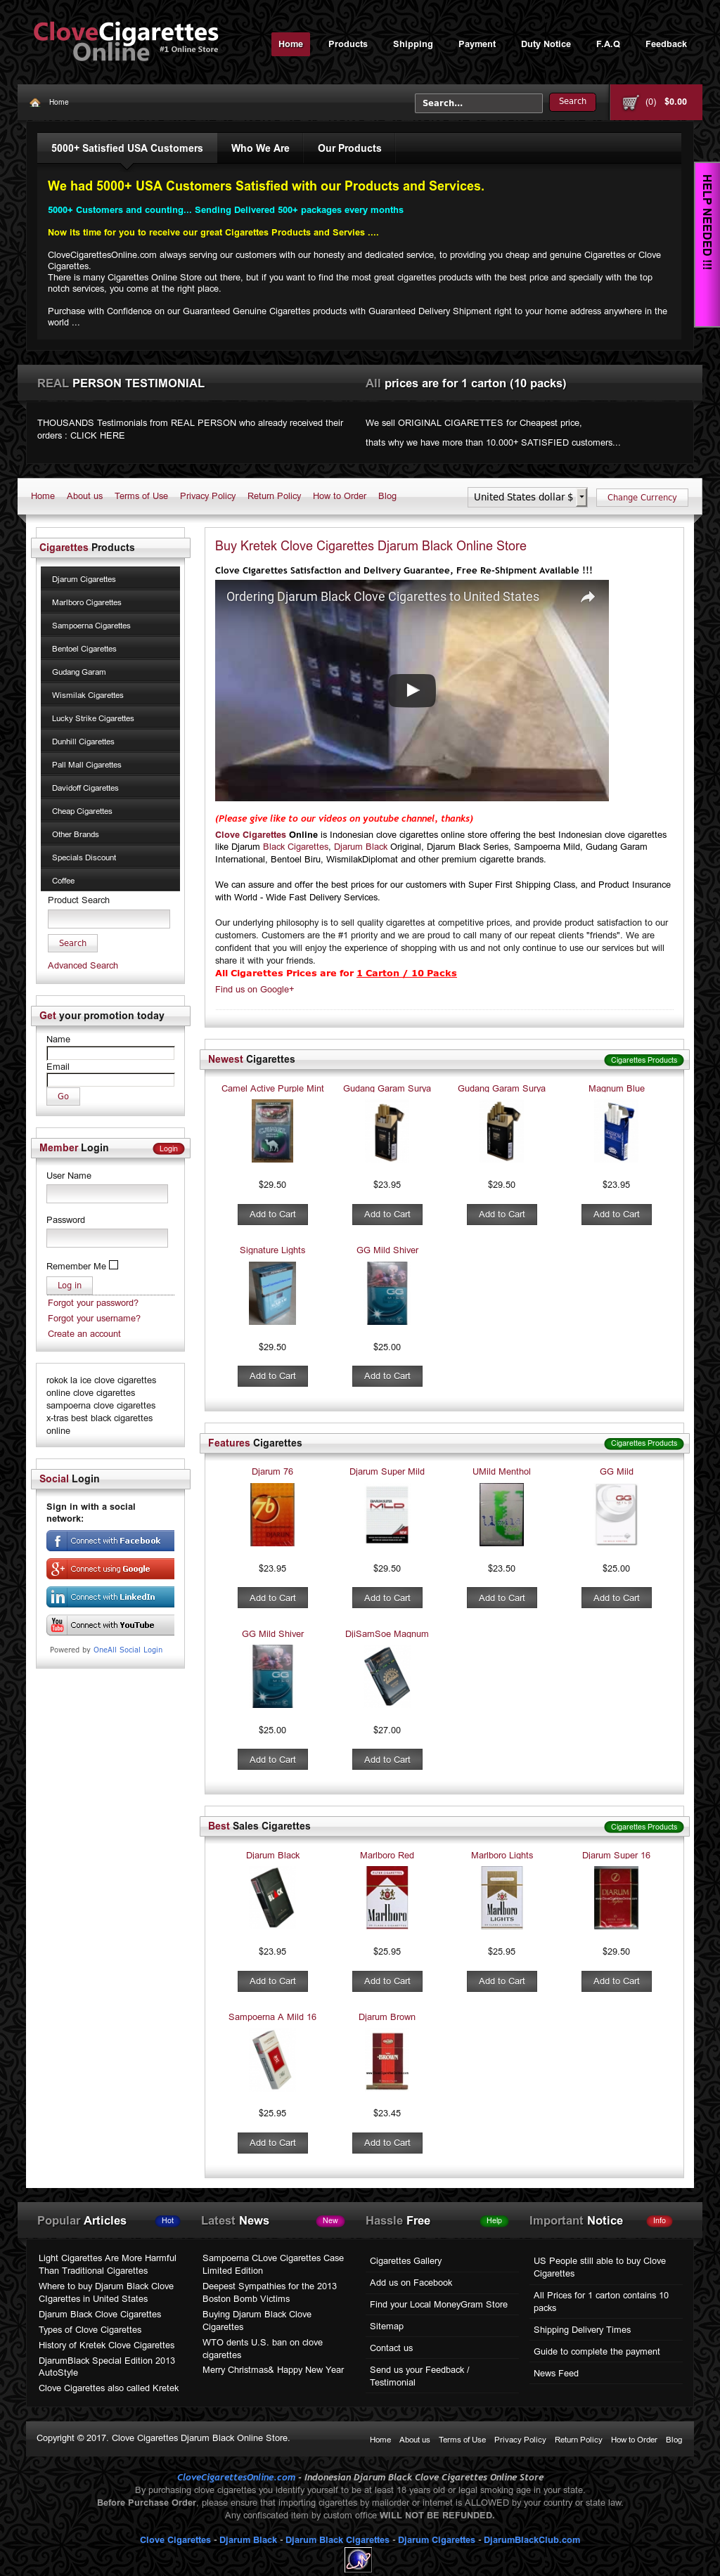 Sampoerna Clove Cigarettes Online Karmashares Llc Leveraging Umild 16 Owler Reports Djarum Black Store Blog Your Answer To Good Quality Kretek